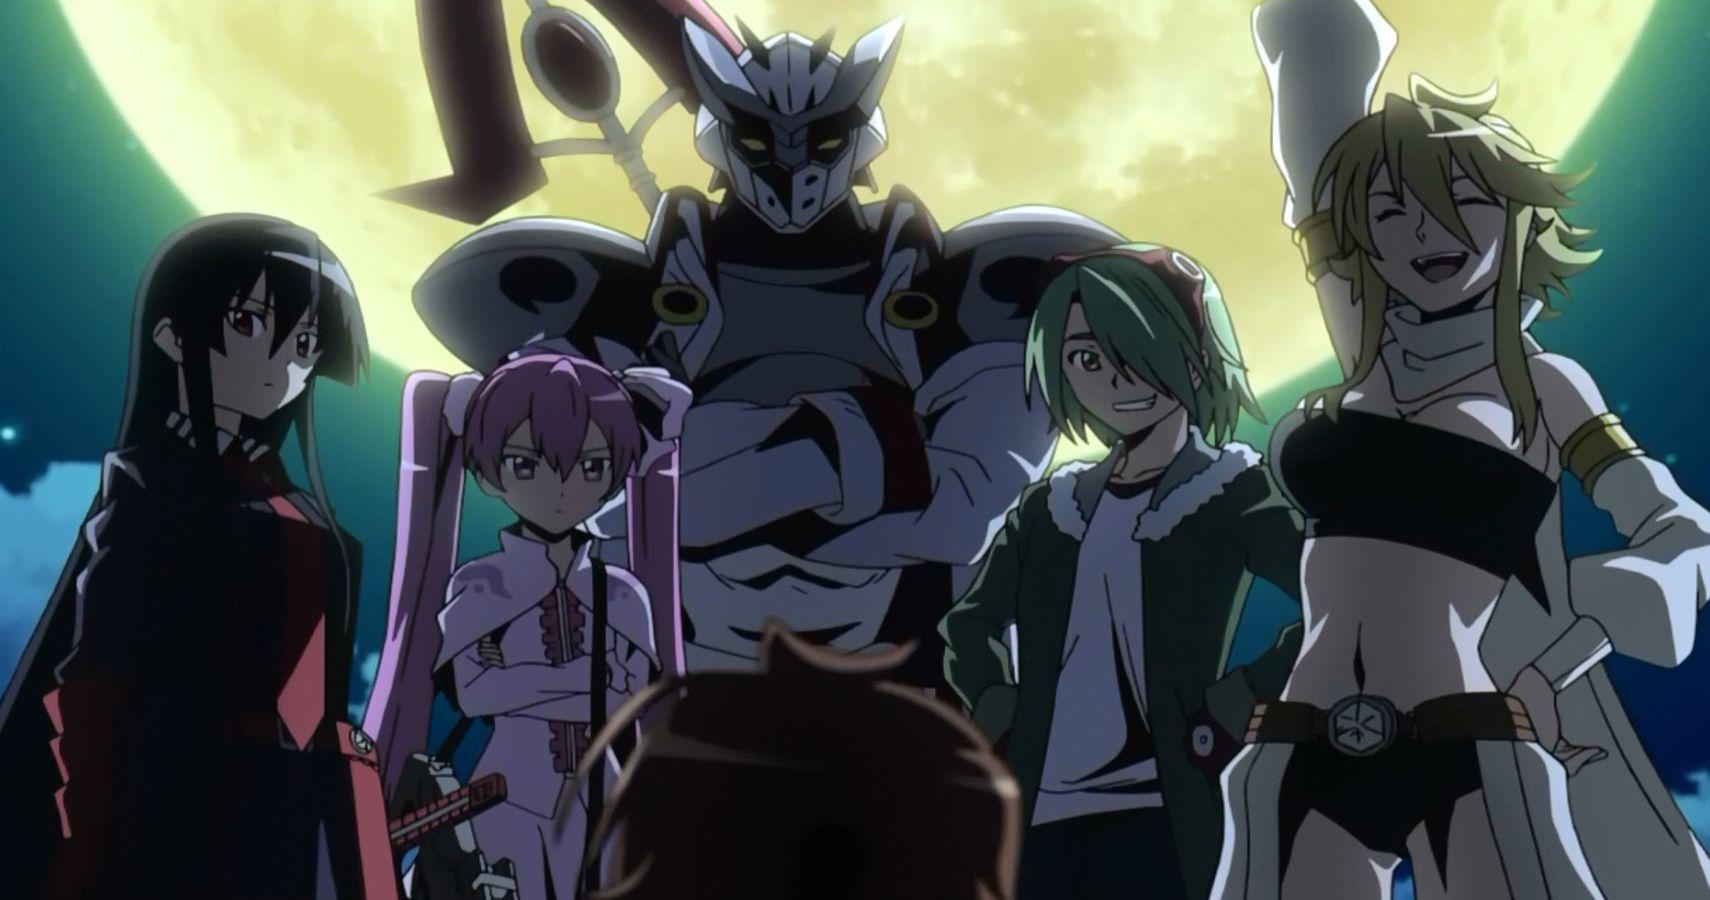 Akame Ga Kill: The 10 Saddest Deaths In The Anime, Ranked | CBR